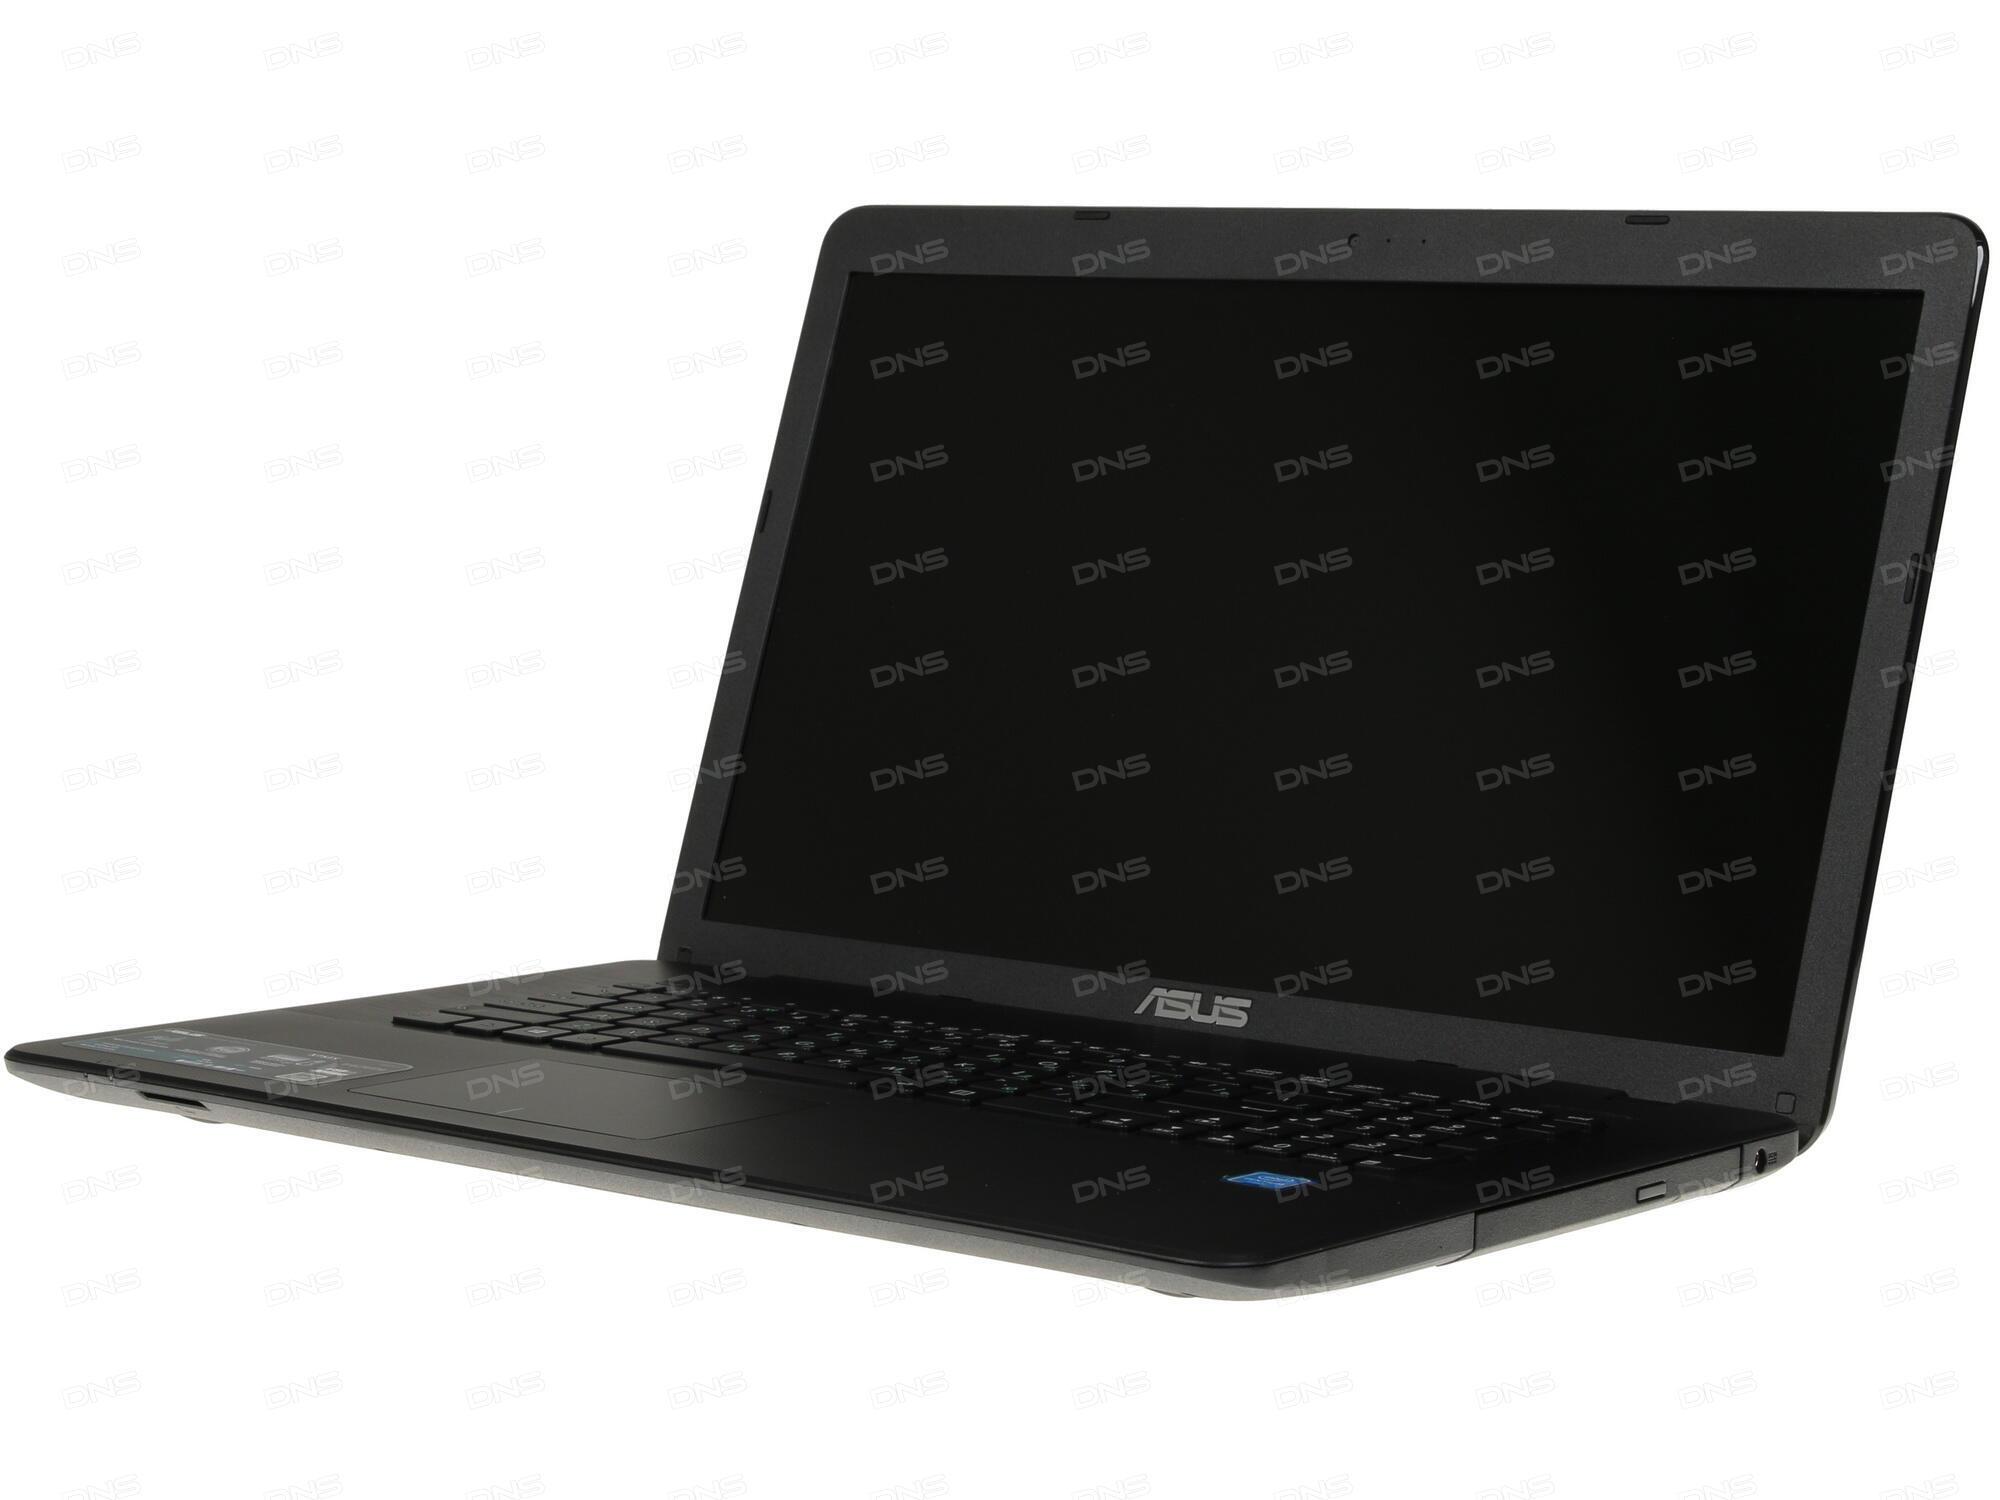 ноутбук asus x751sa ty165d драйвера